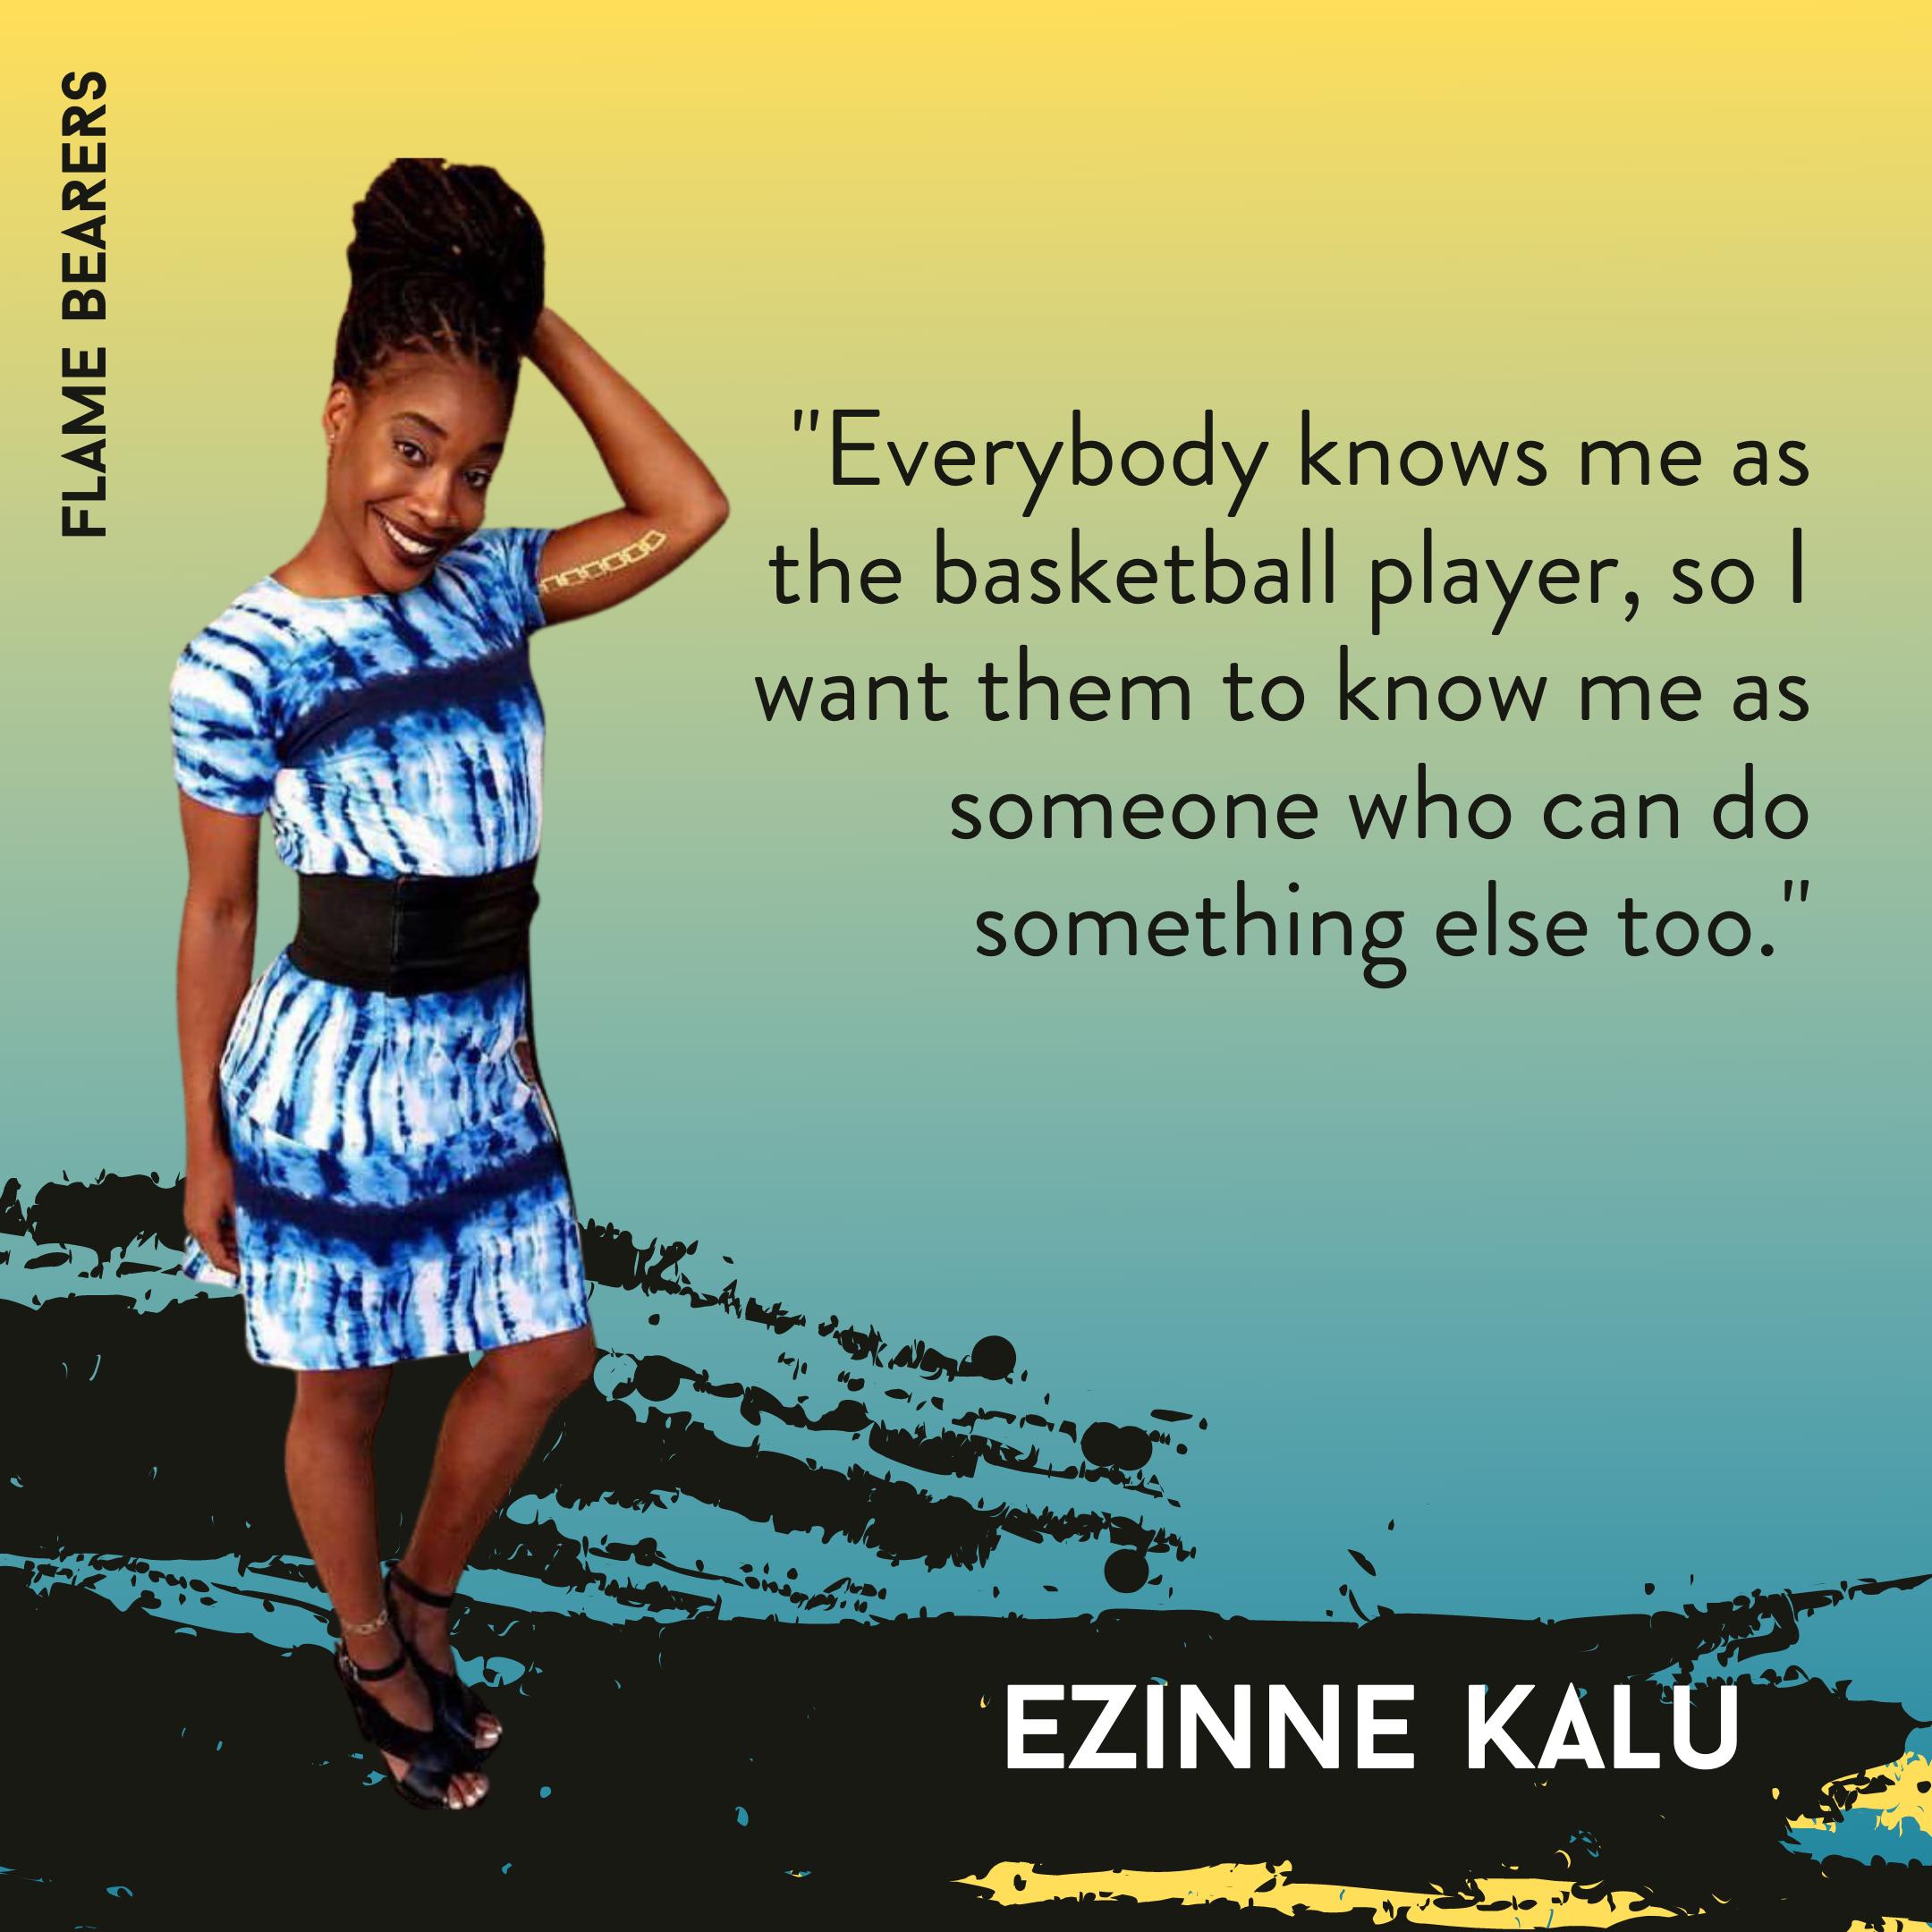 Ezinne Kalu-Phelps Olympics